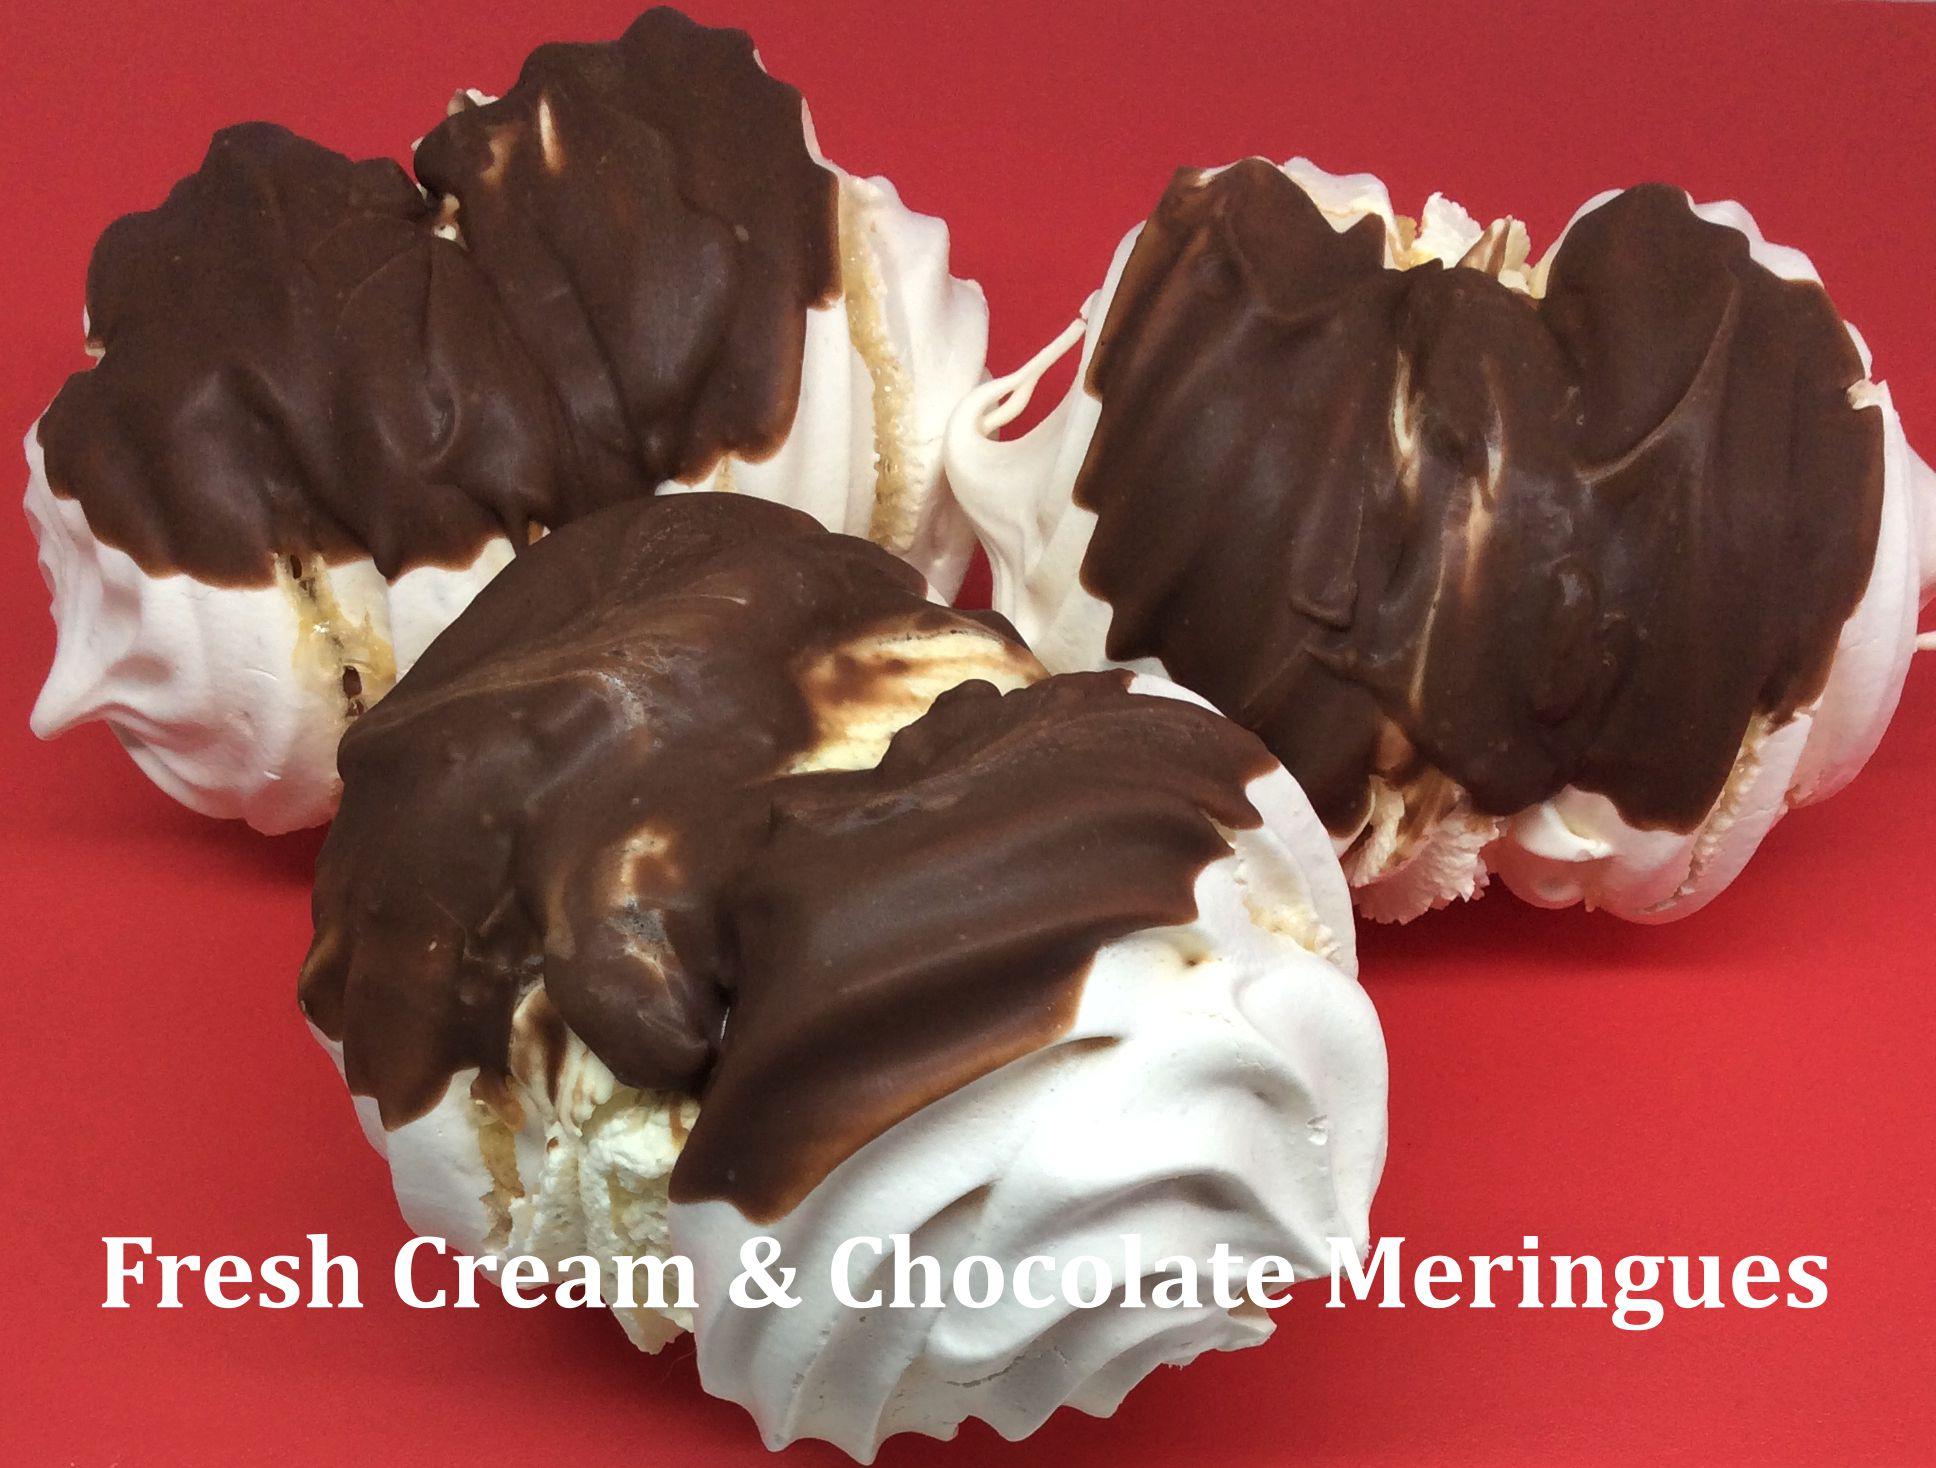 Fresh Cream and Chocolate Meringues